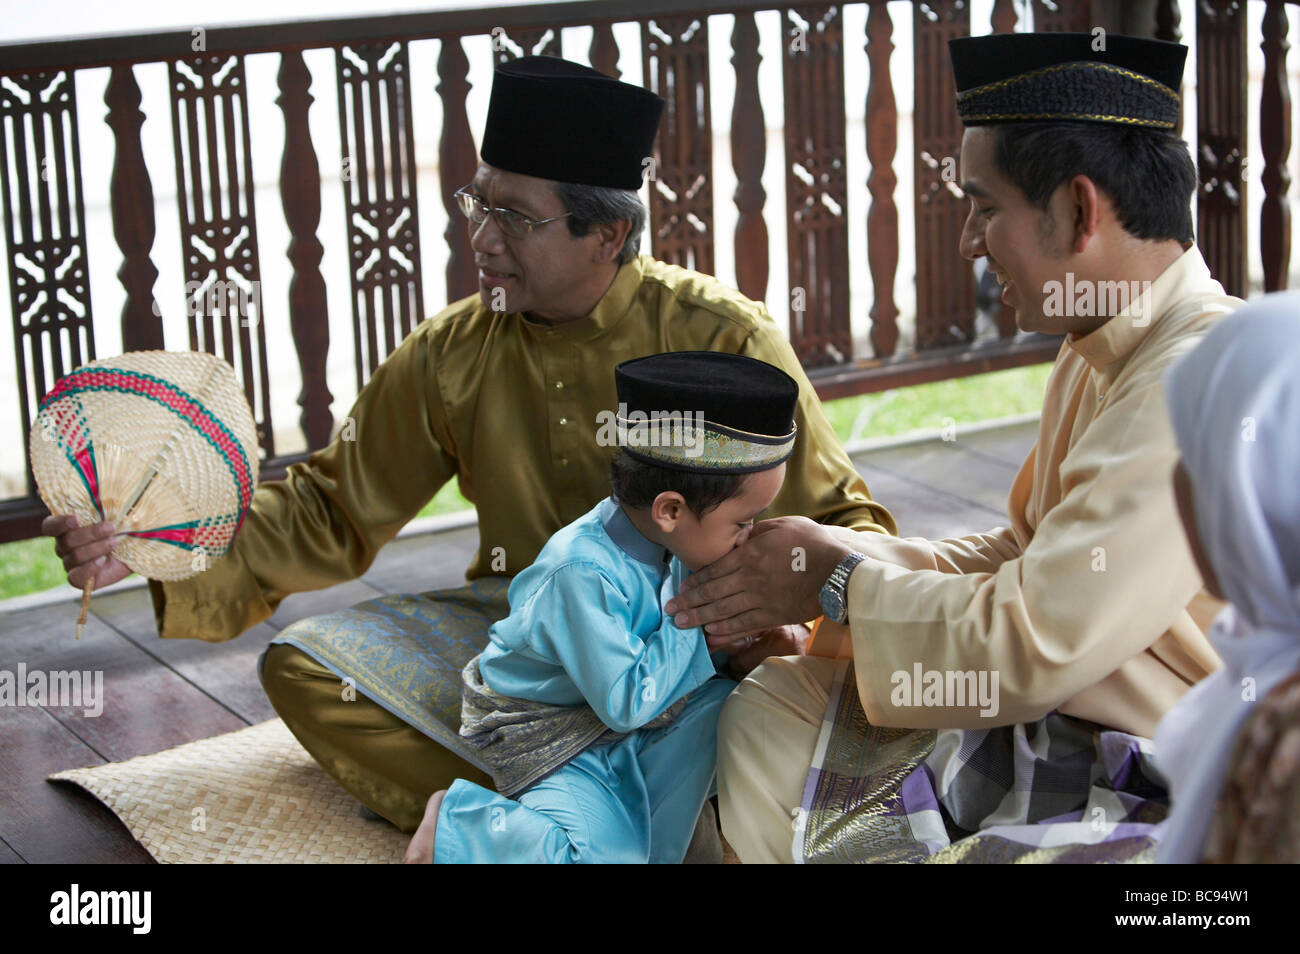 kid greeting to family member - Stock Image